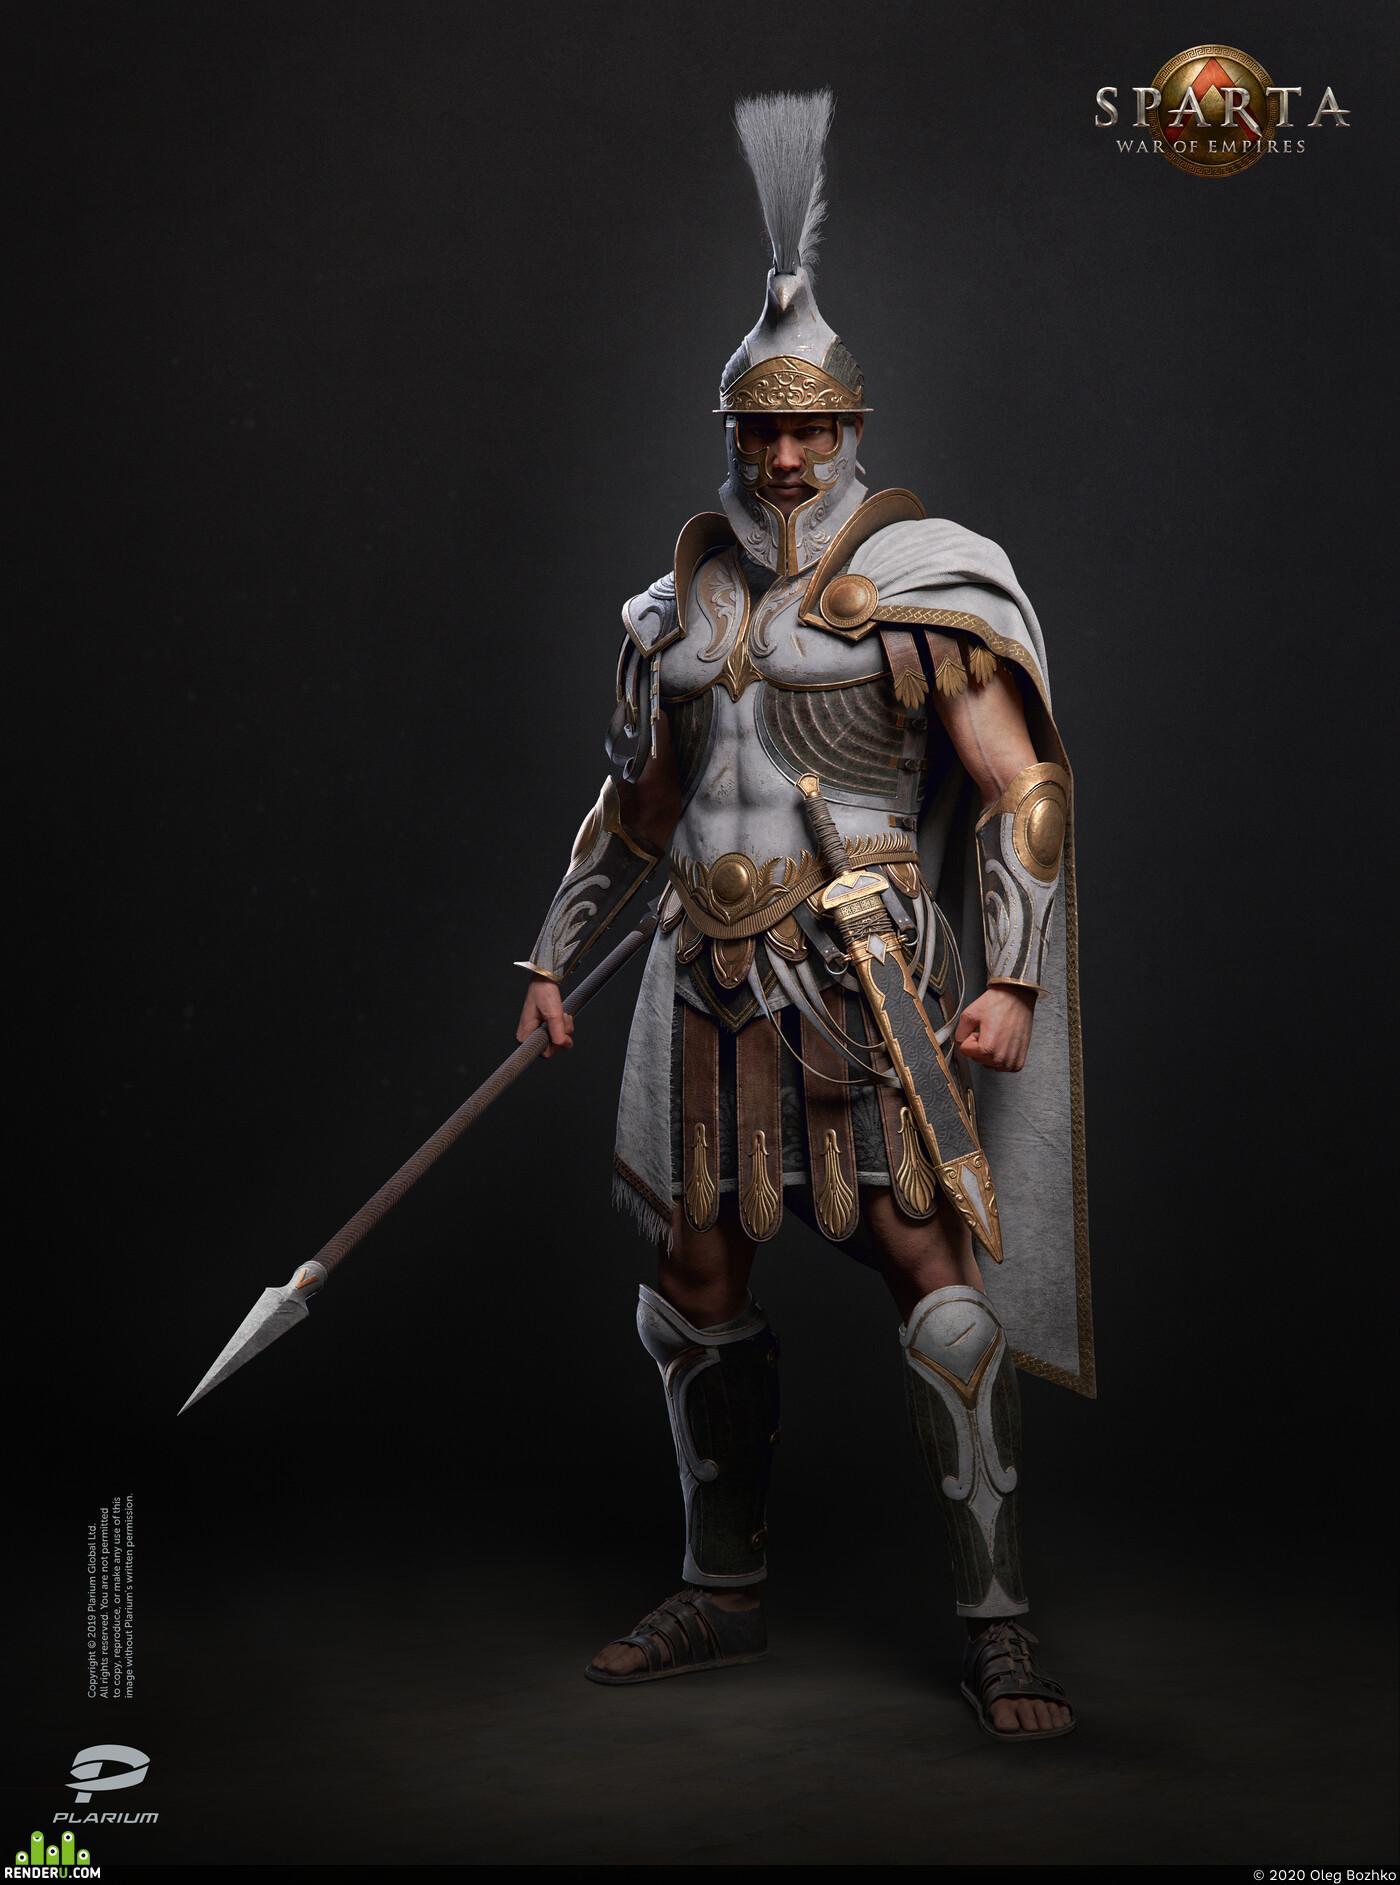 Characters, characterdesign, characterart